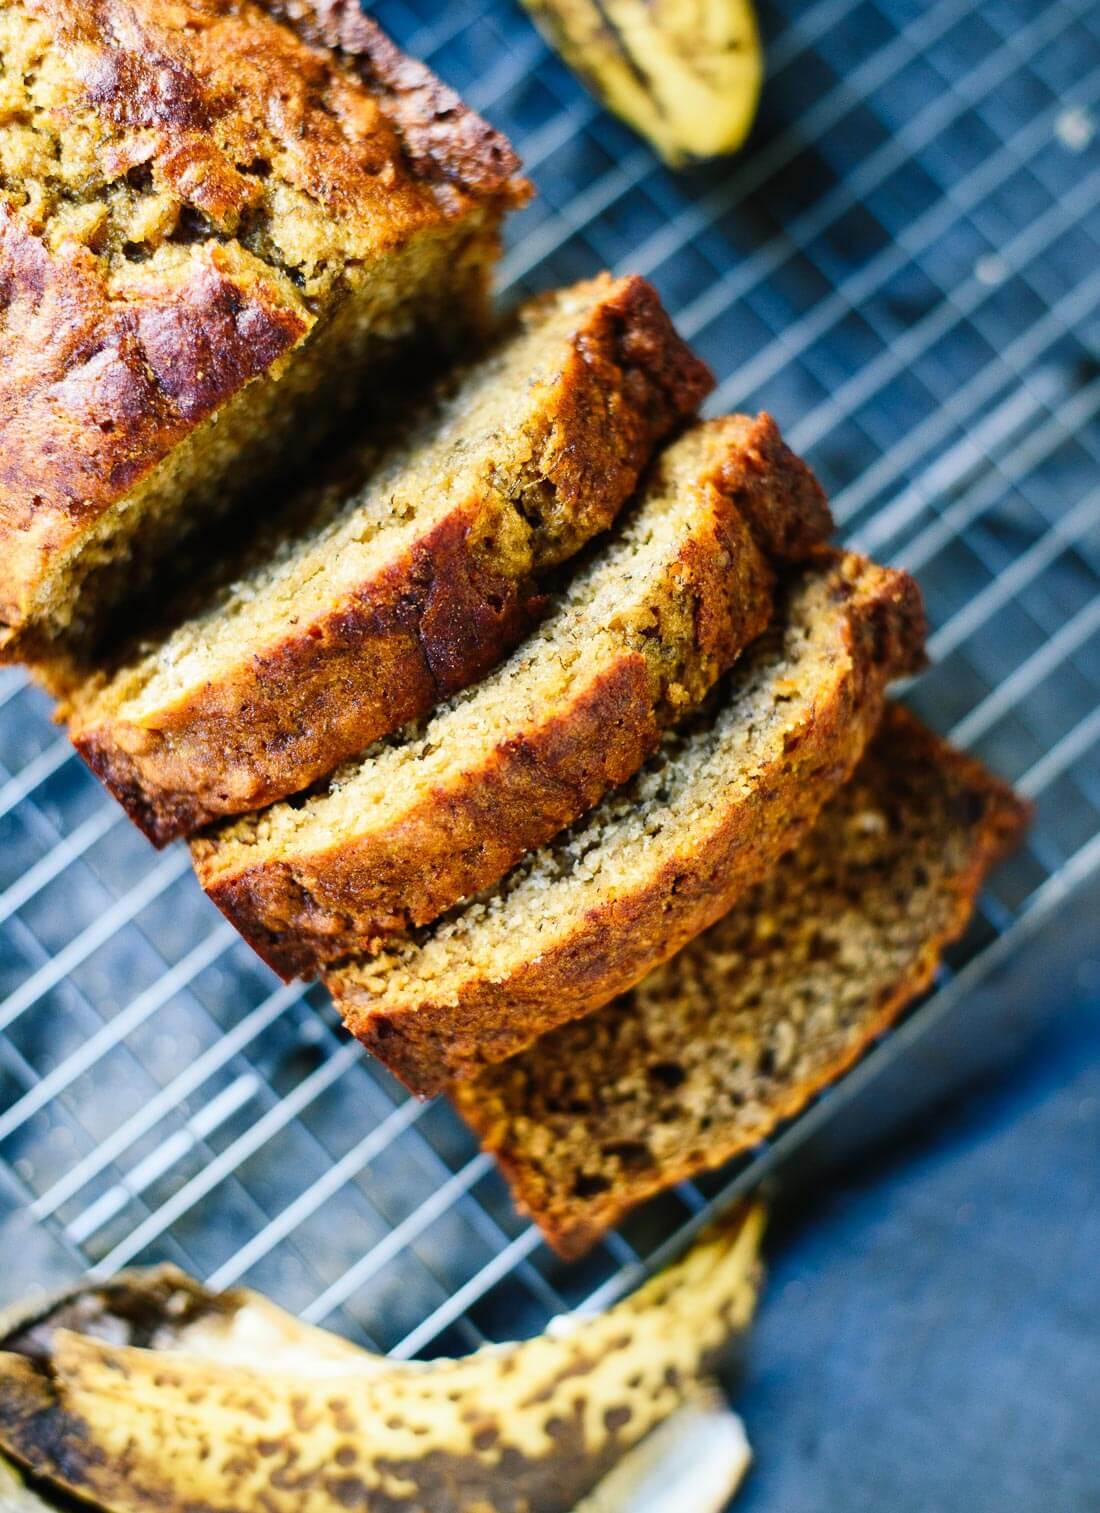 Banana Bread Recipe Healthy  Healthy Banana Bread Recipe Cookie and Kate